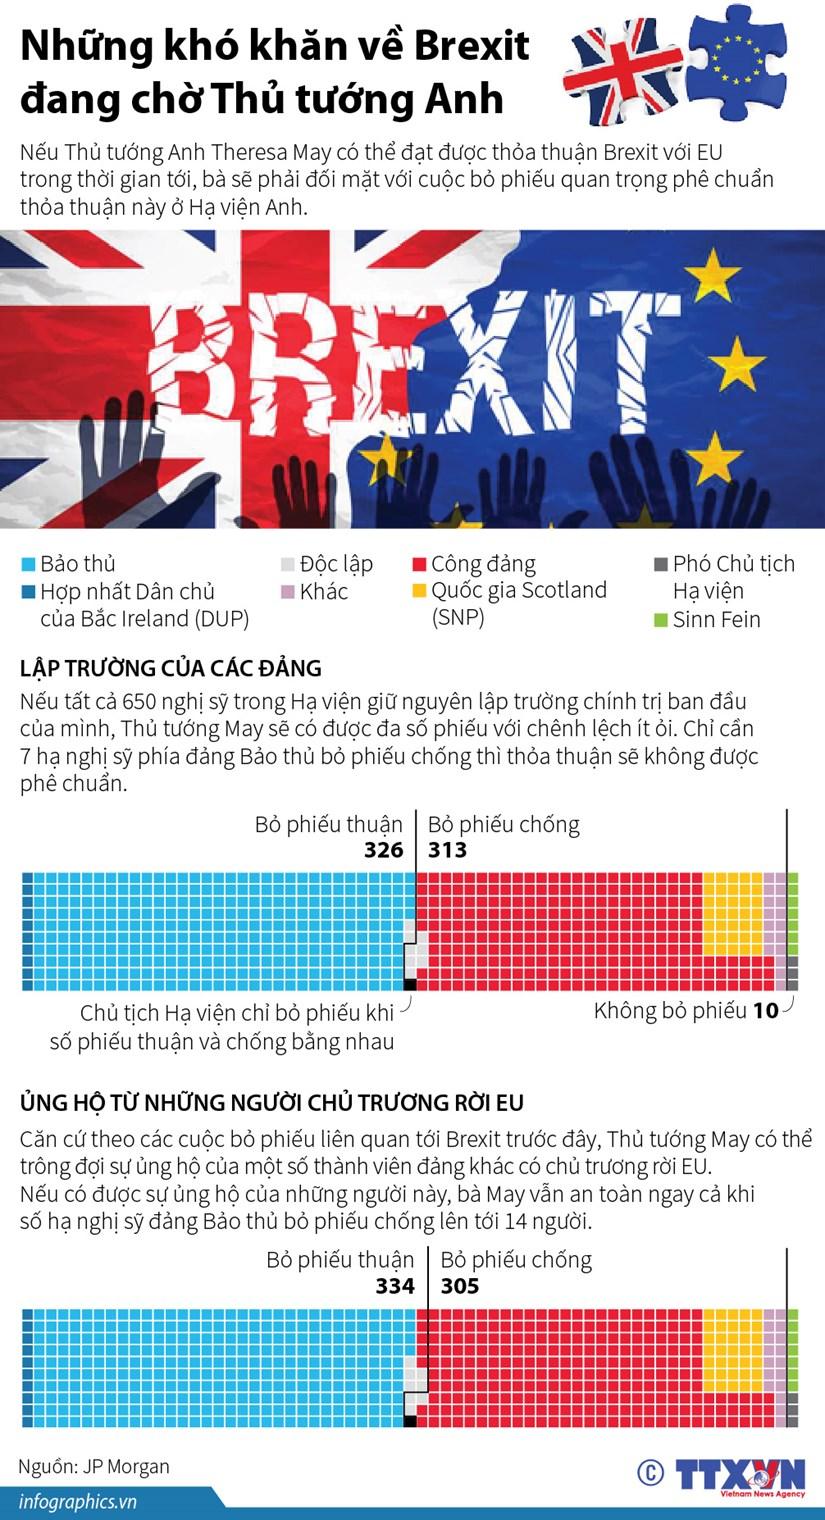 [Infographics] Nhung kho khan ve Brexit dang cho Thu tuong Anh hinh anh 1